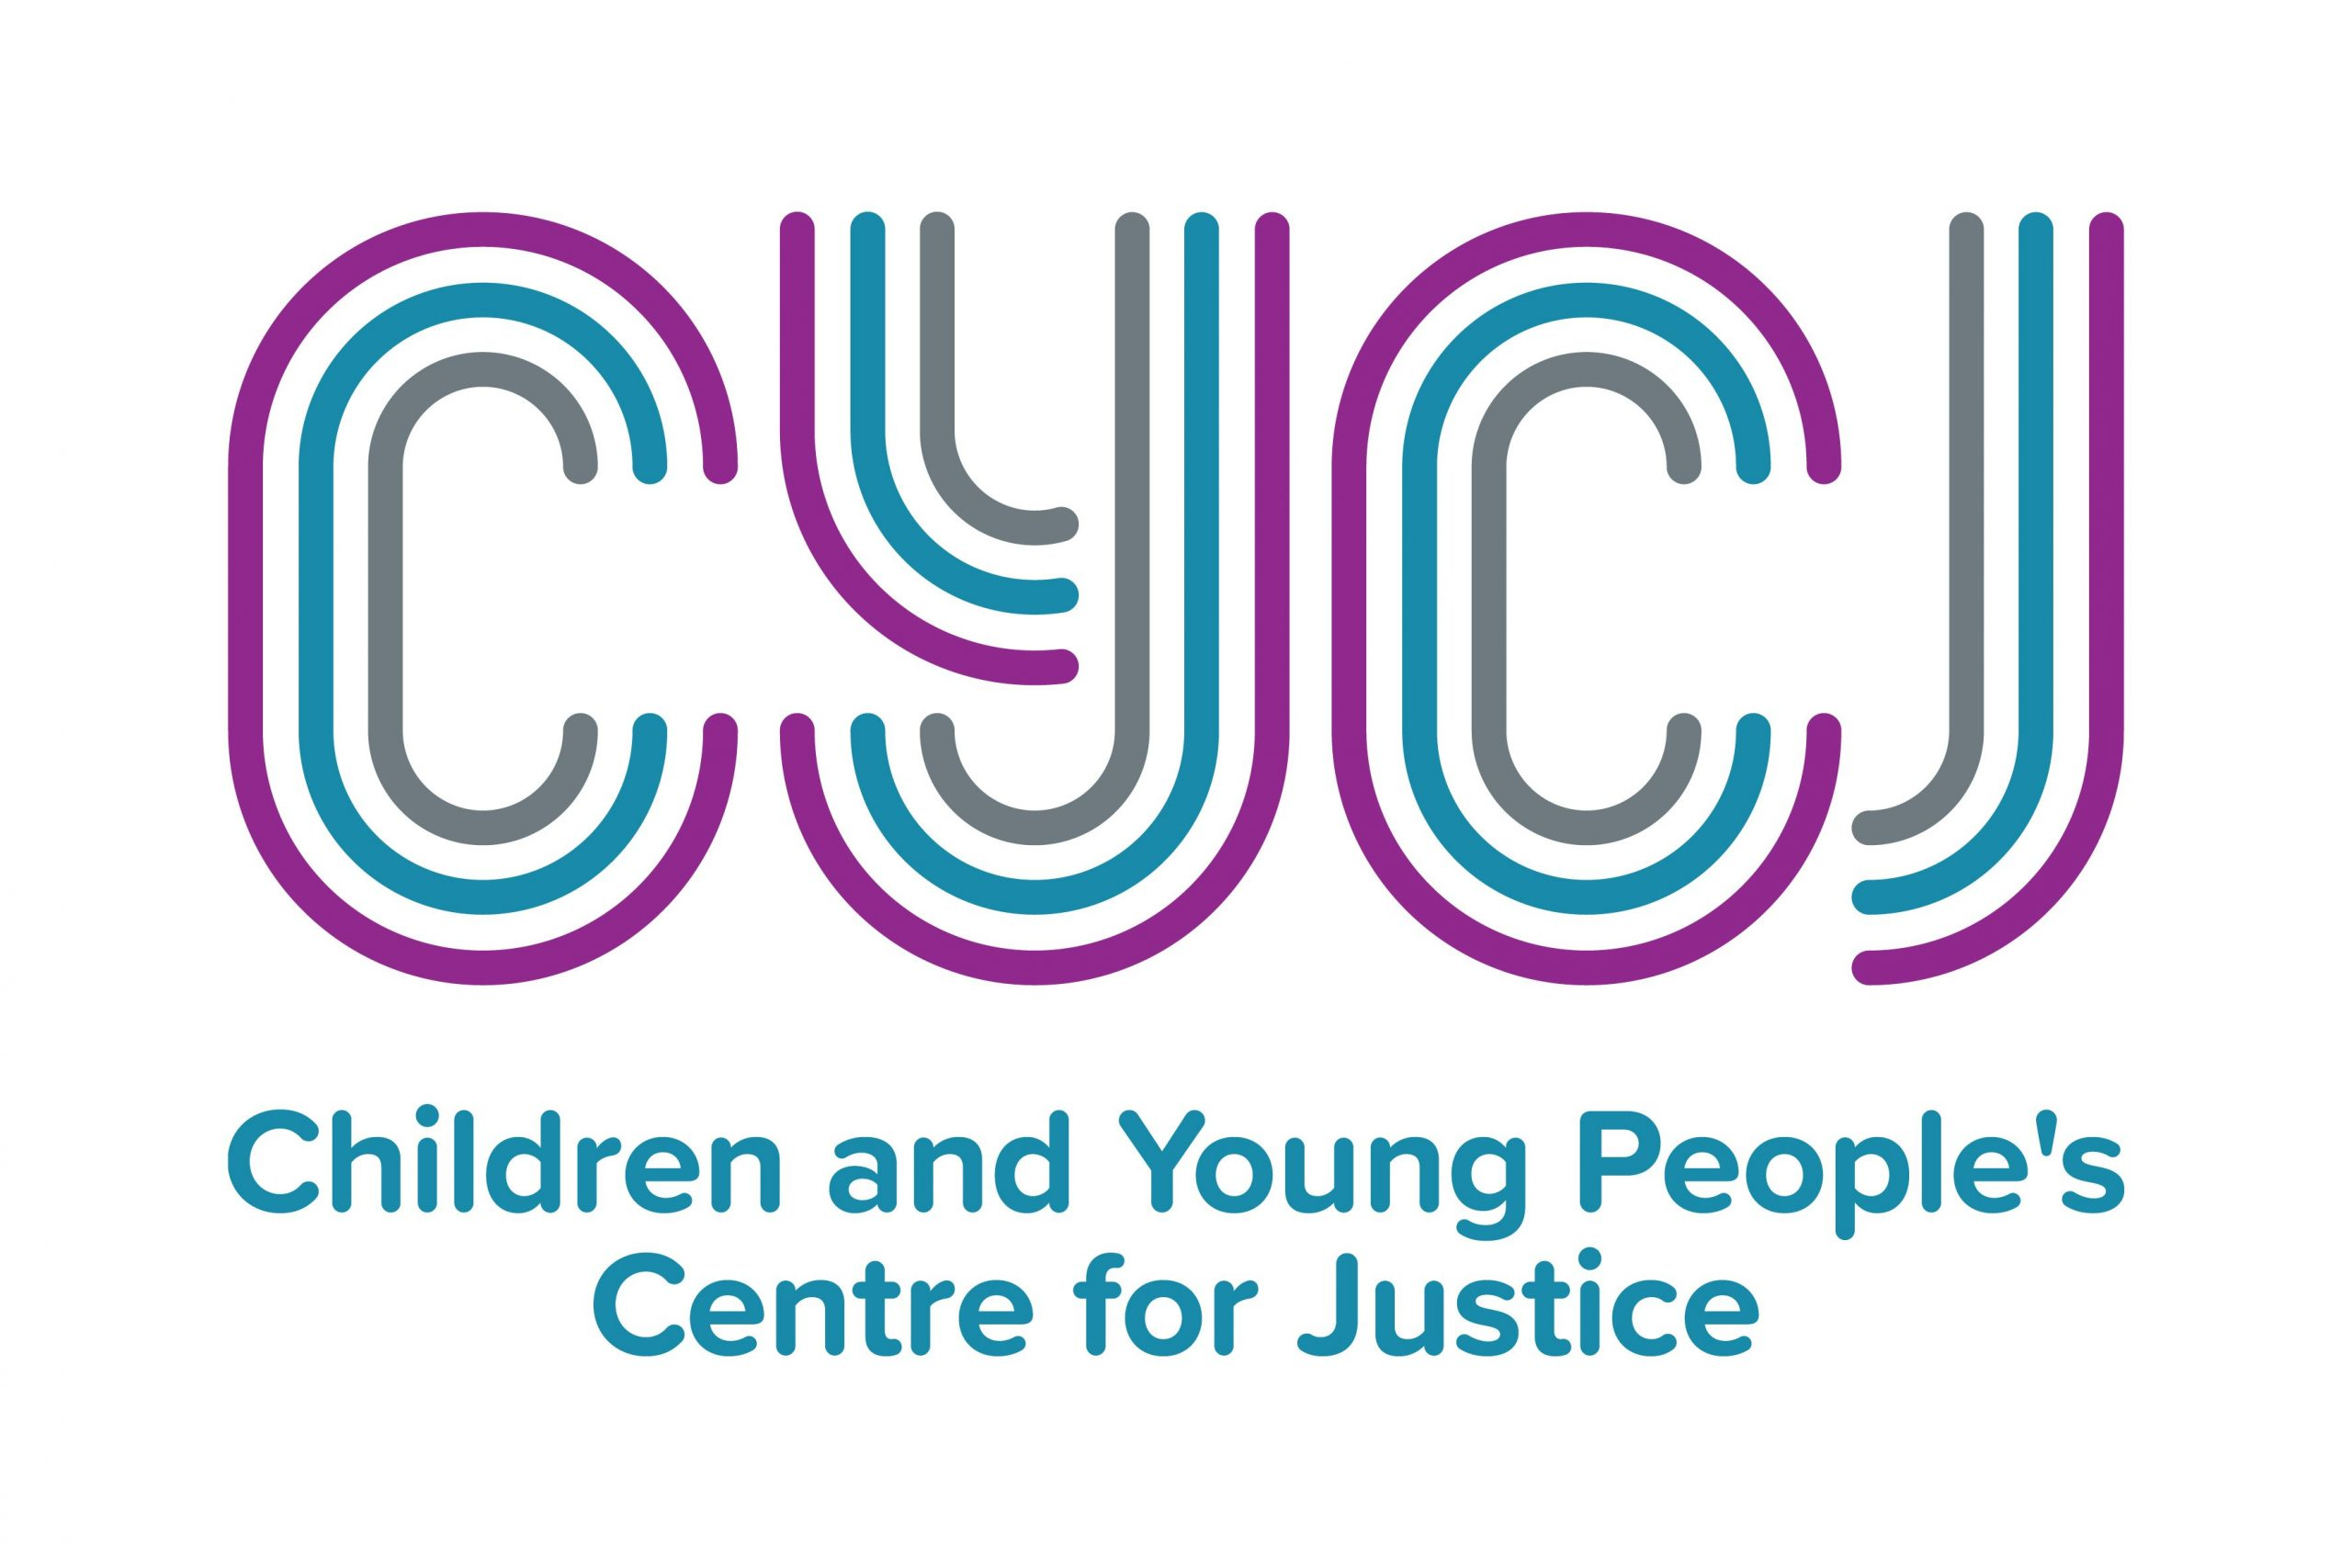 CYCJ new logo 2020 colour